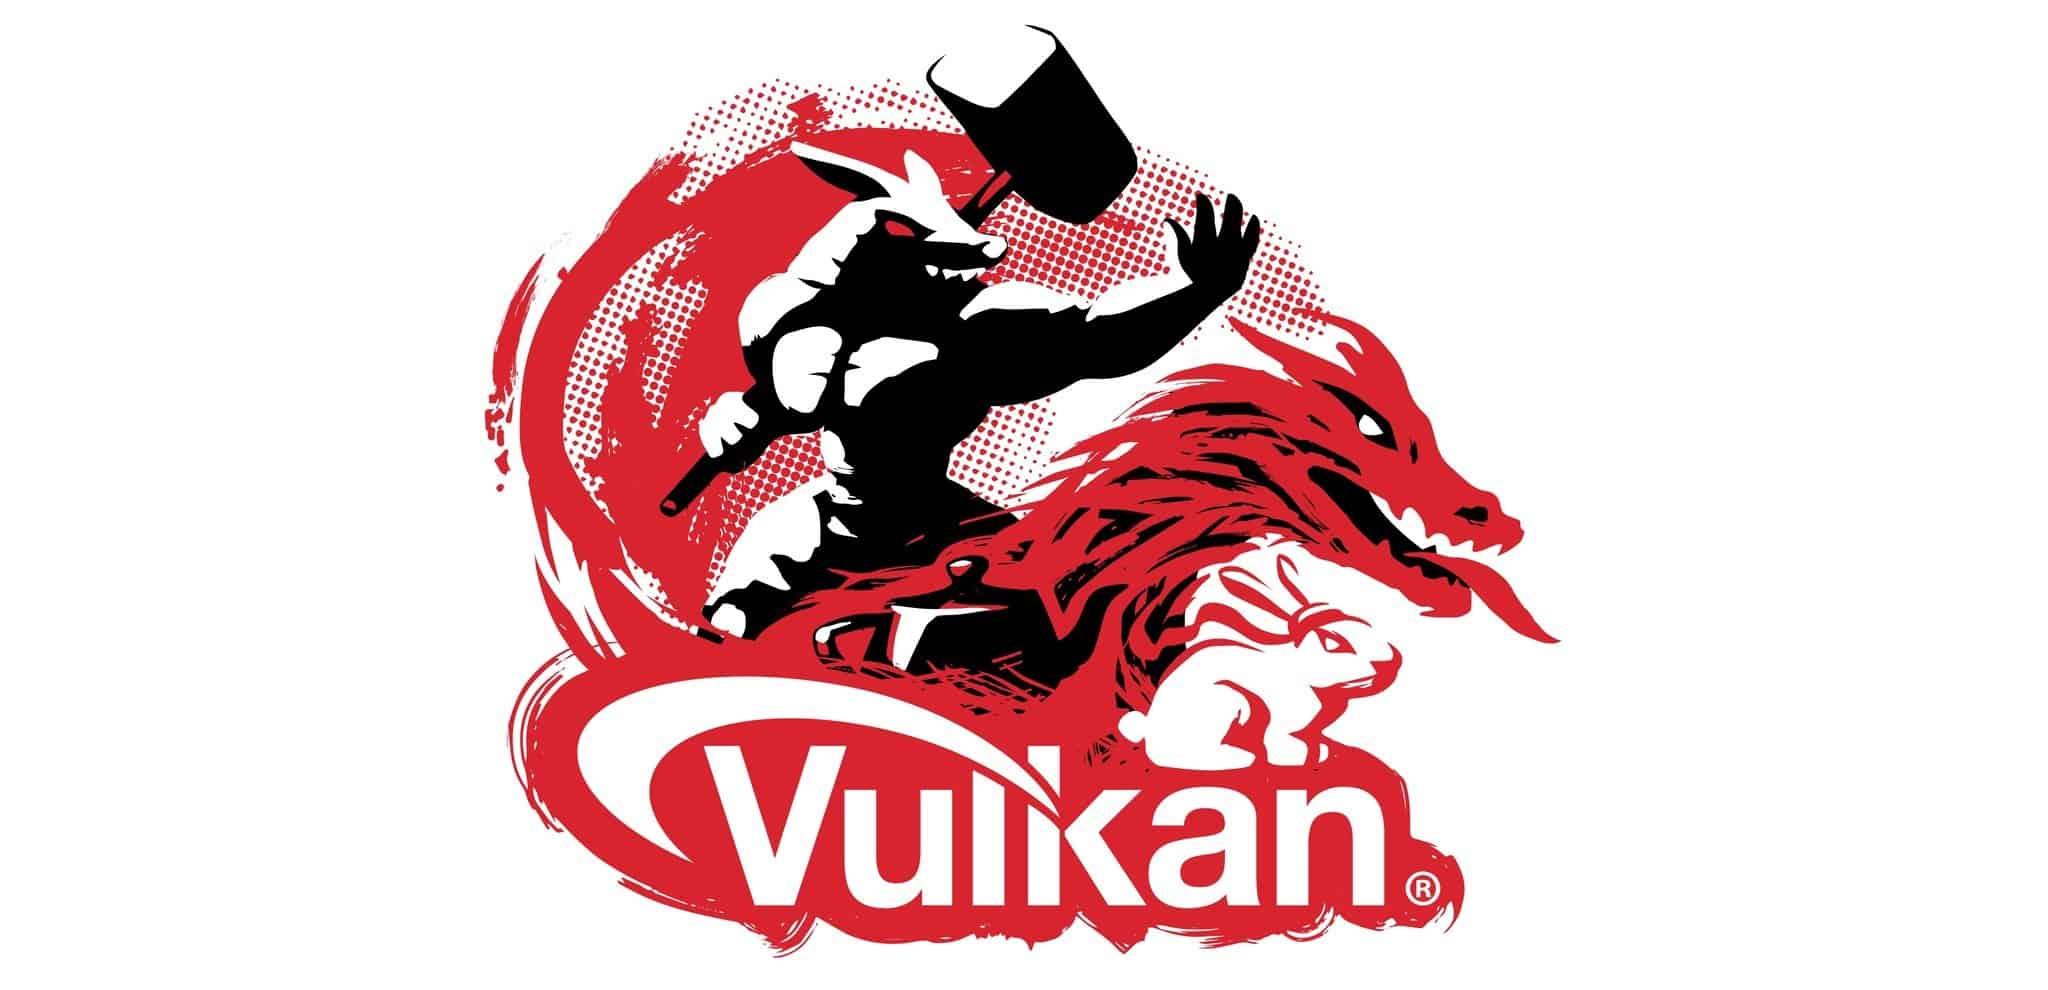 Vulkan 2018 Graphic - Khronos Group rilascia Vulkan 1.1